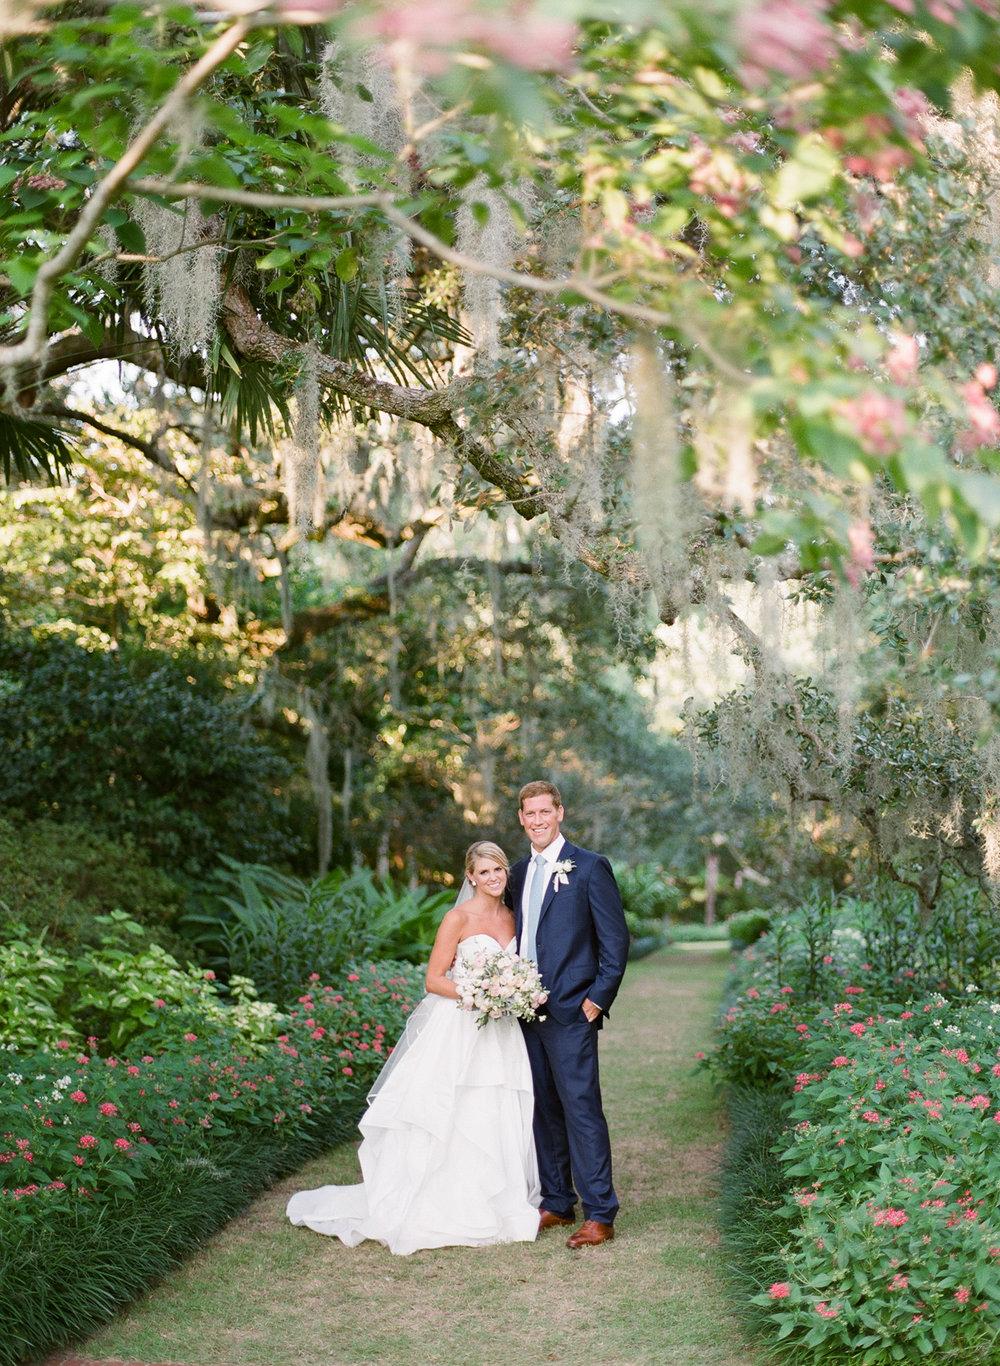 Airlie-Gardens-Wedding-45.jpg